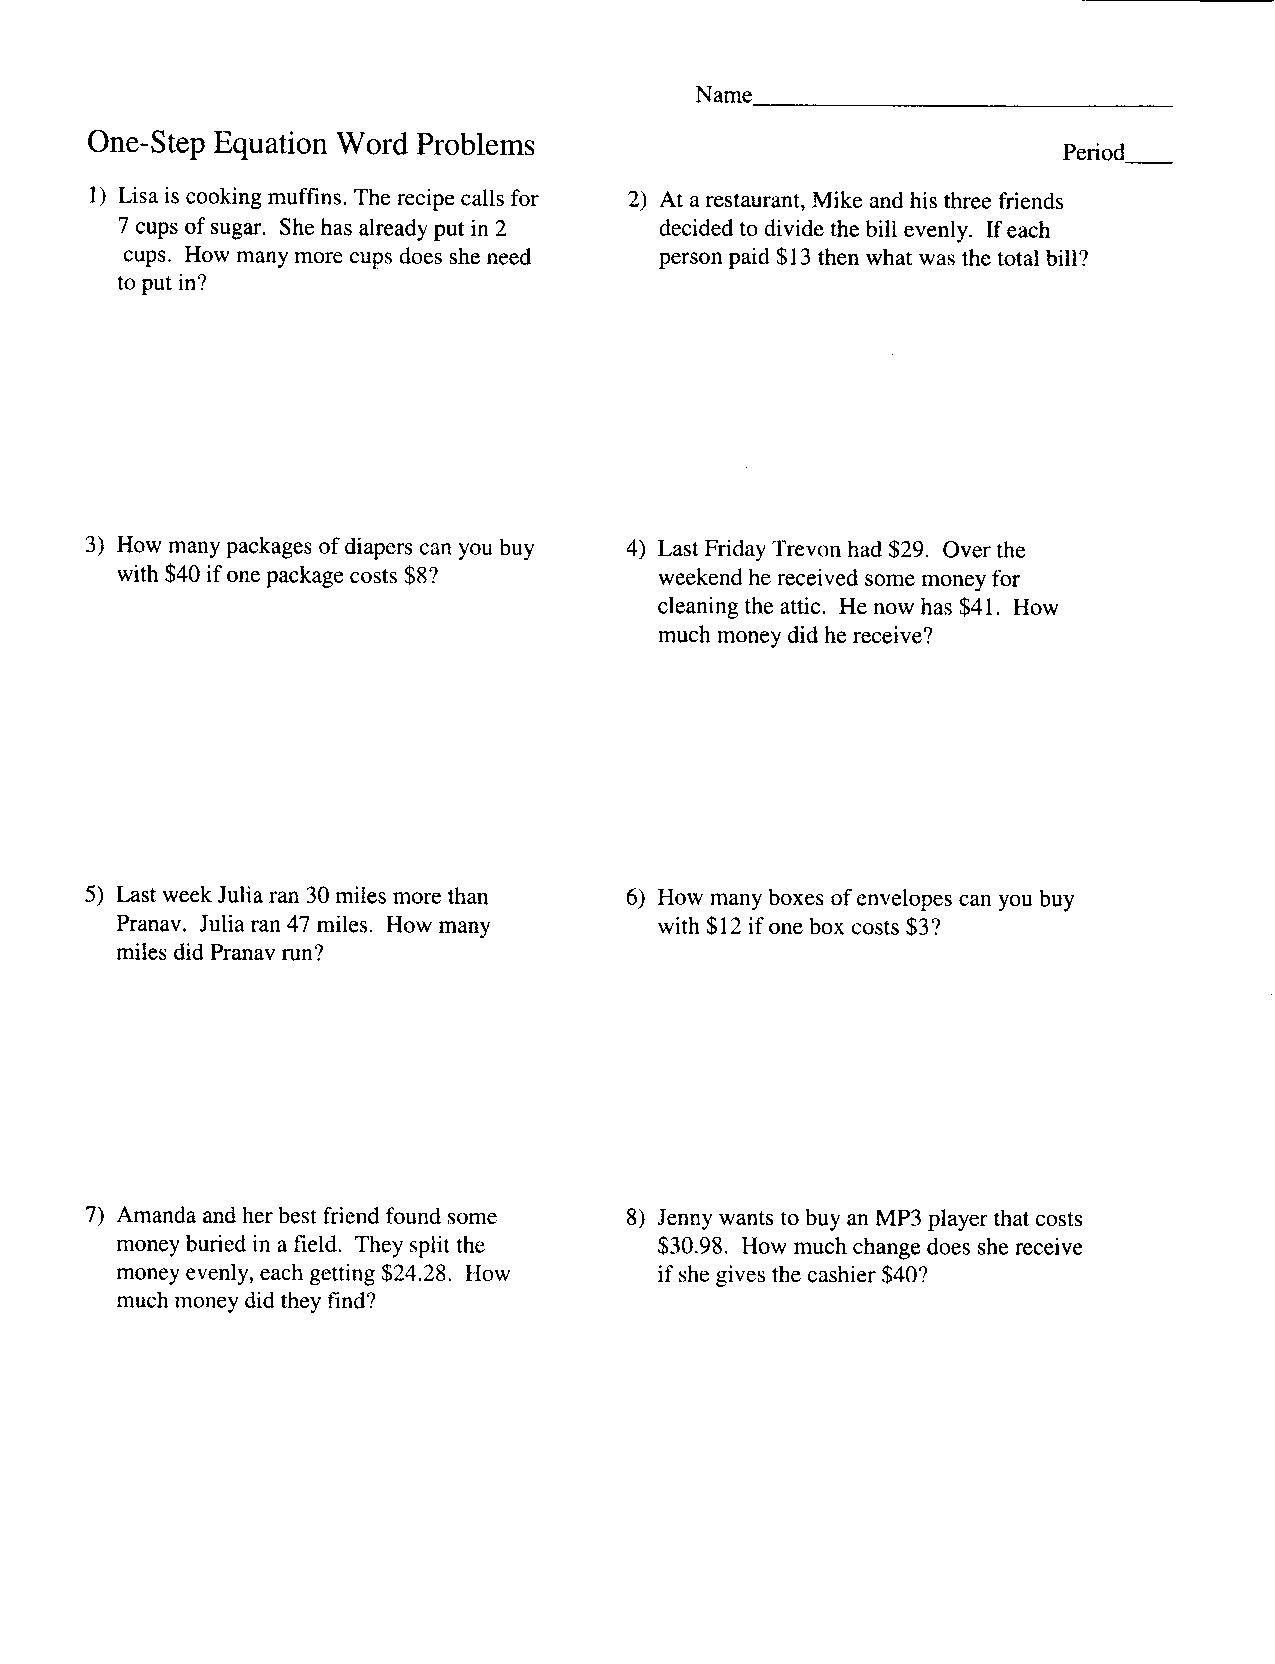 Writing Two Step Equations Worksheet Two Step Equation Word Problems Worksheet Pdf Tessshebaylo